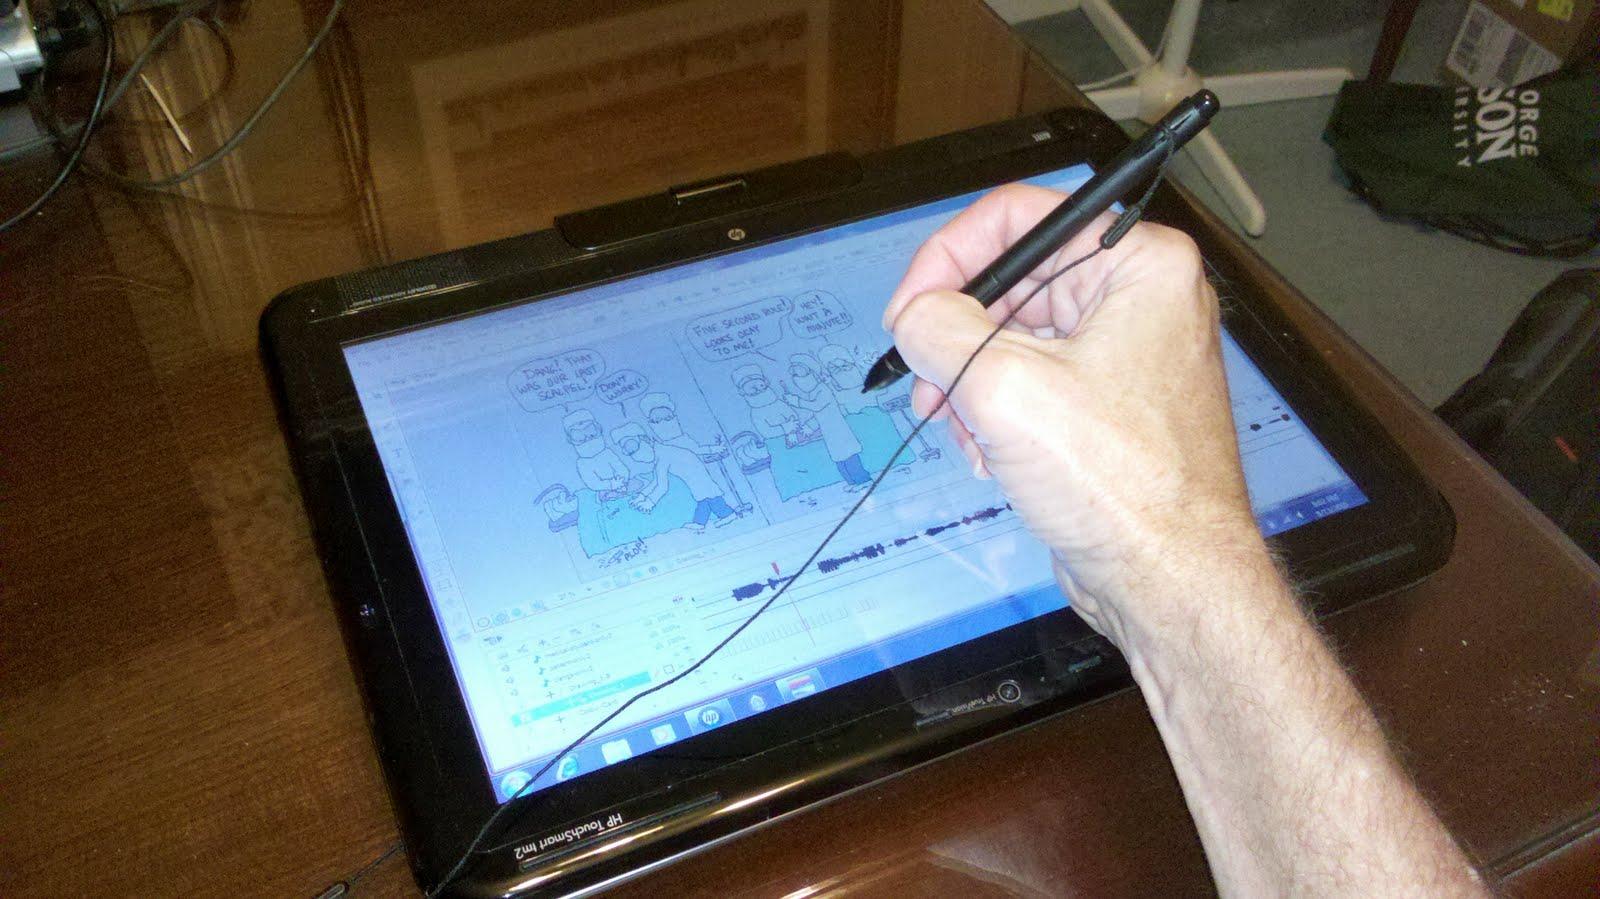 Cartoon Doctor - www.drmussey.com: Finally! A Tablet PC ...